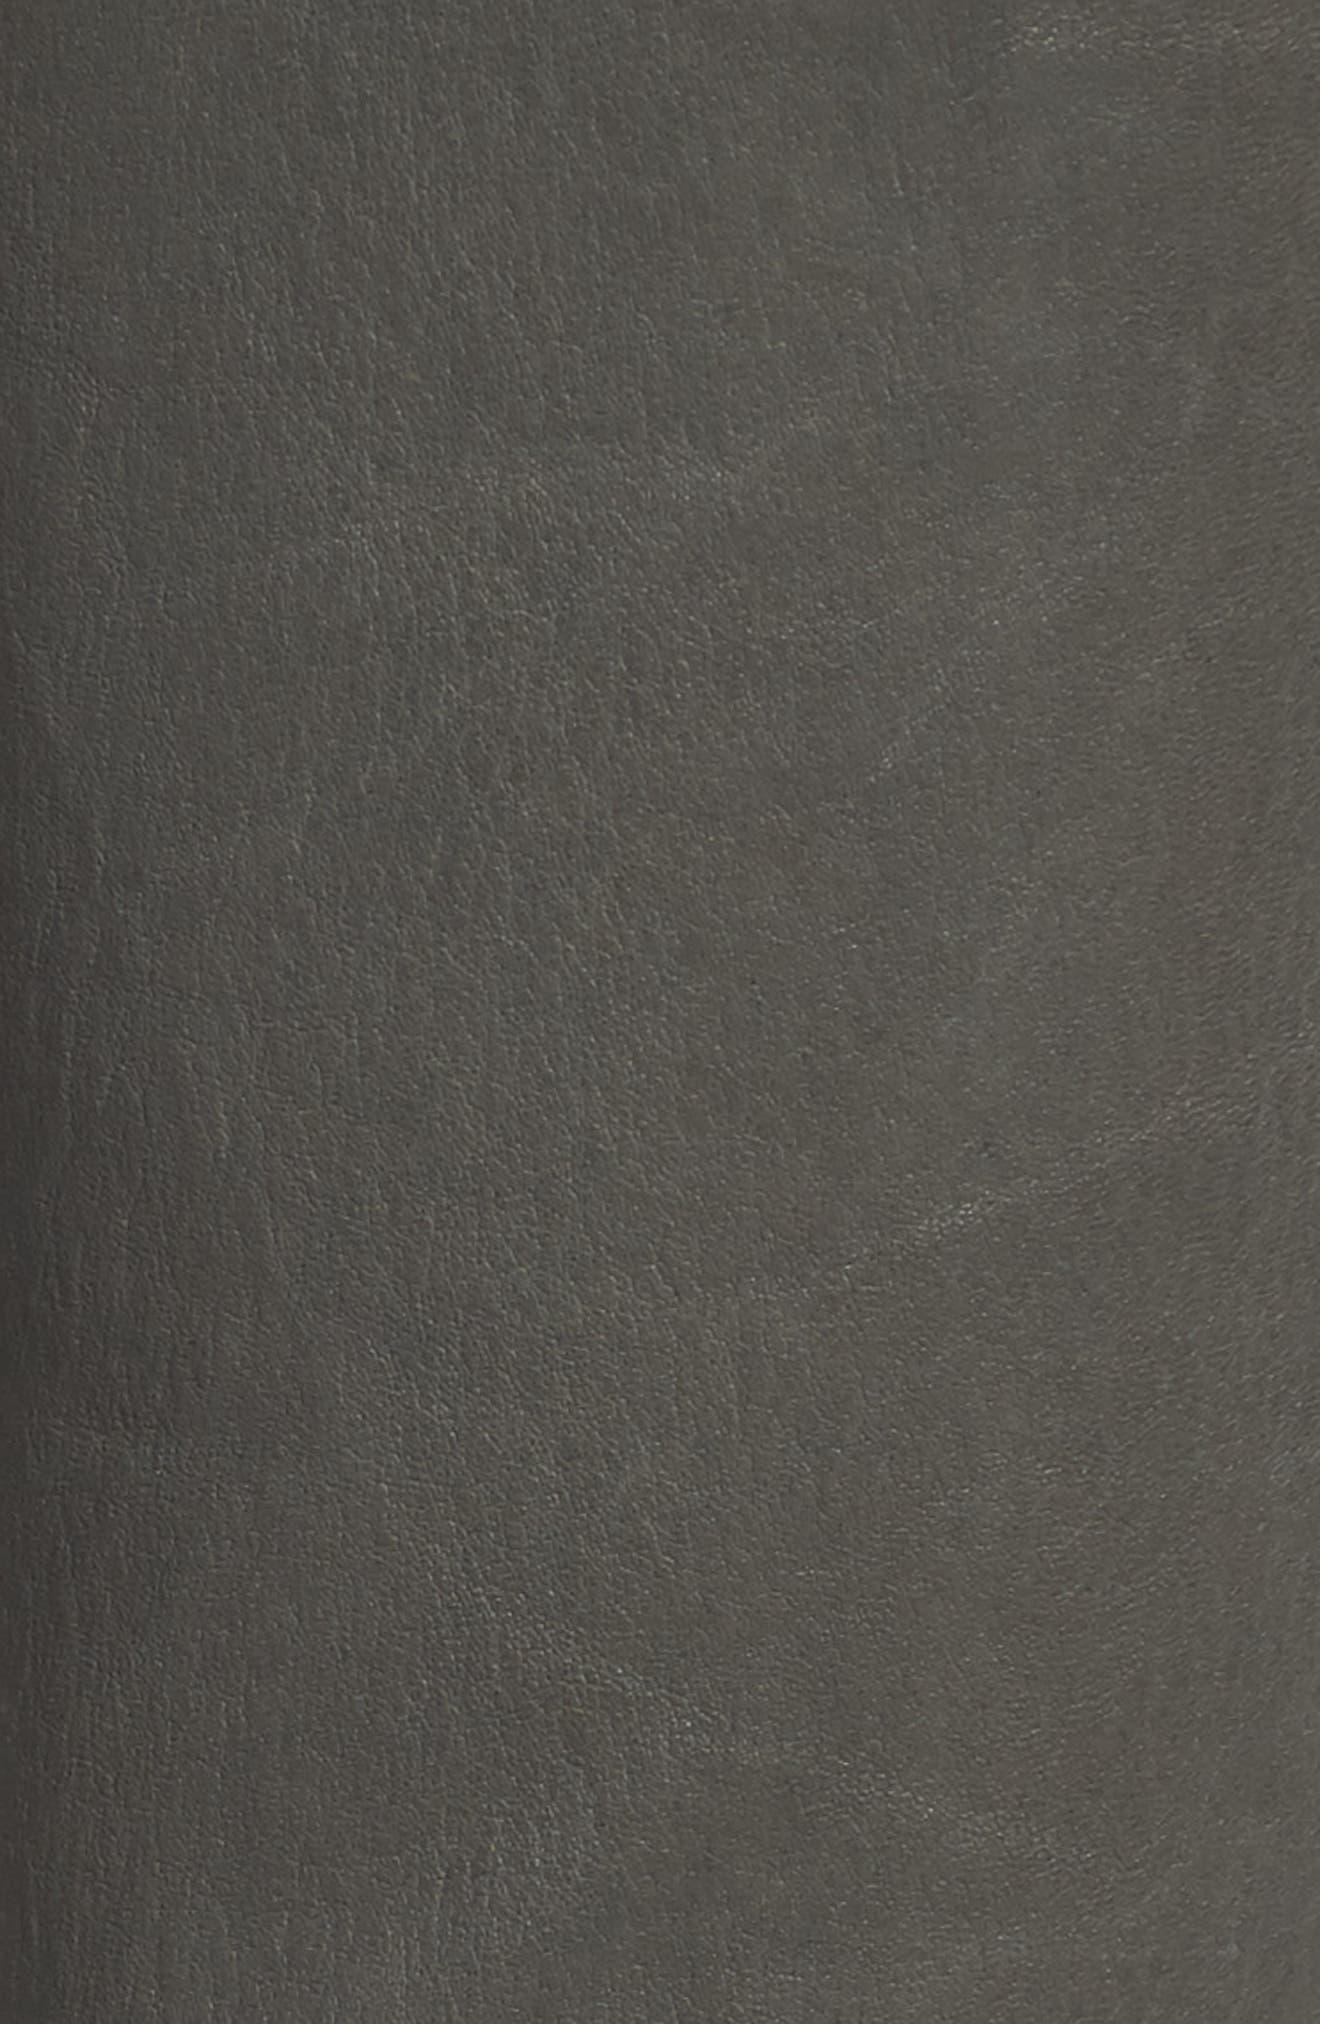 'Maria' Lambskin Leather Leggings,                             Alternate thumbnail 5, color,                             039